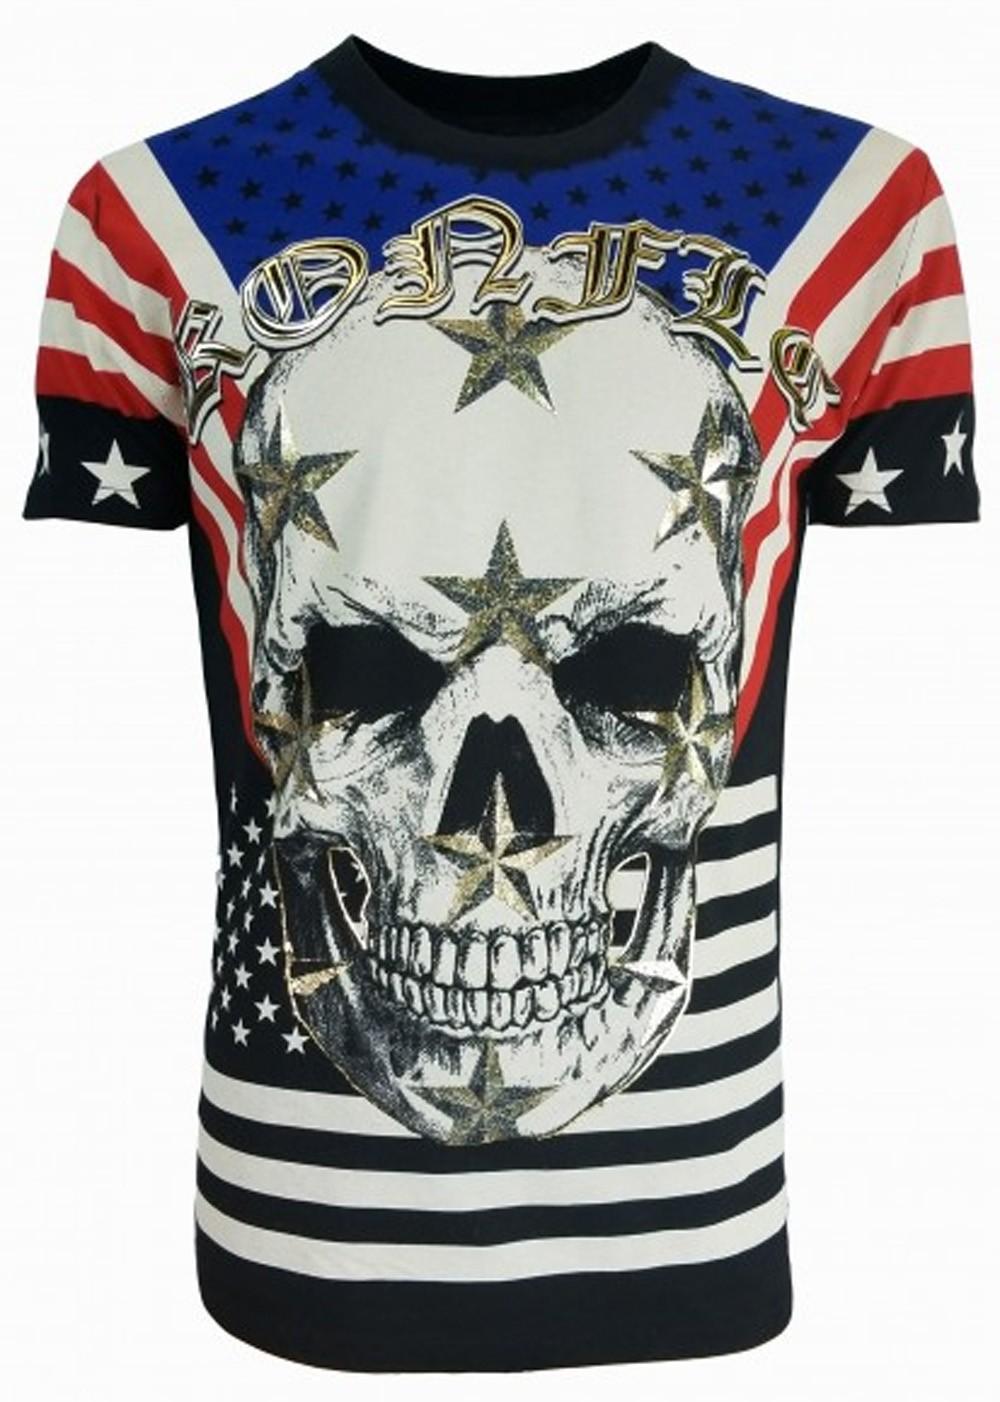 Konflic Clothing - Star Gazer T-Shirt